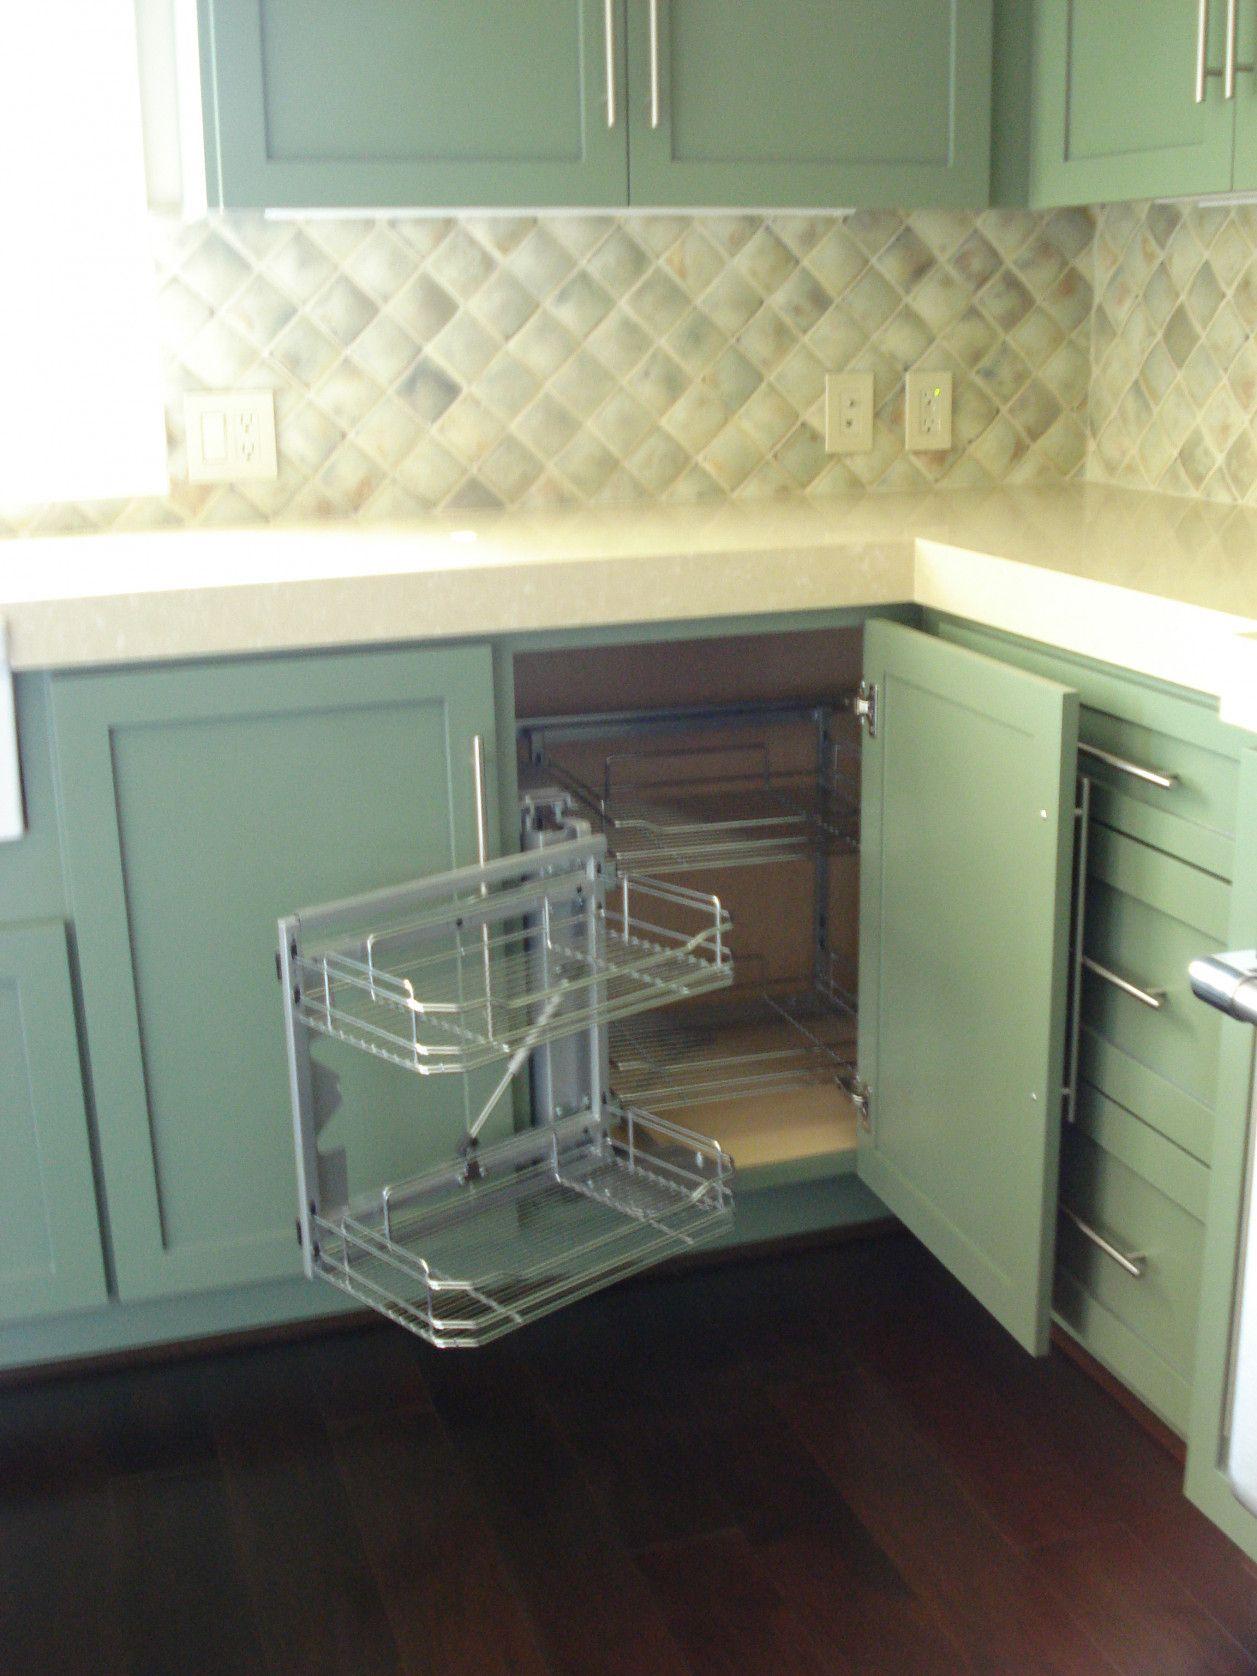 Pin By Rahayu12 On Interior Analogi Corner Cupboard Kitchen